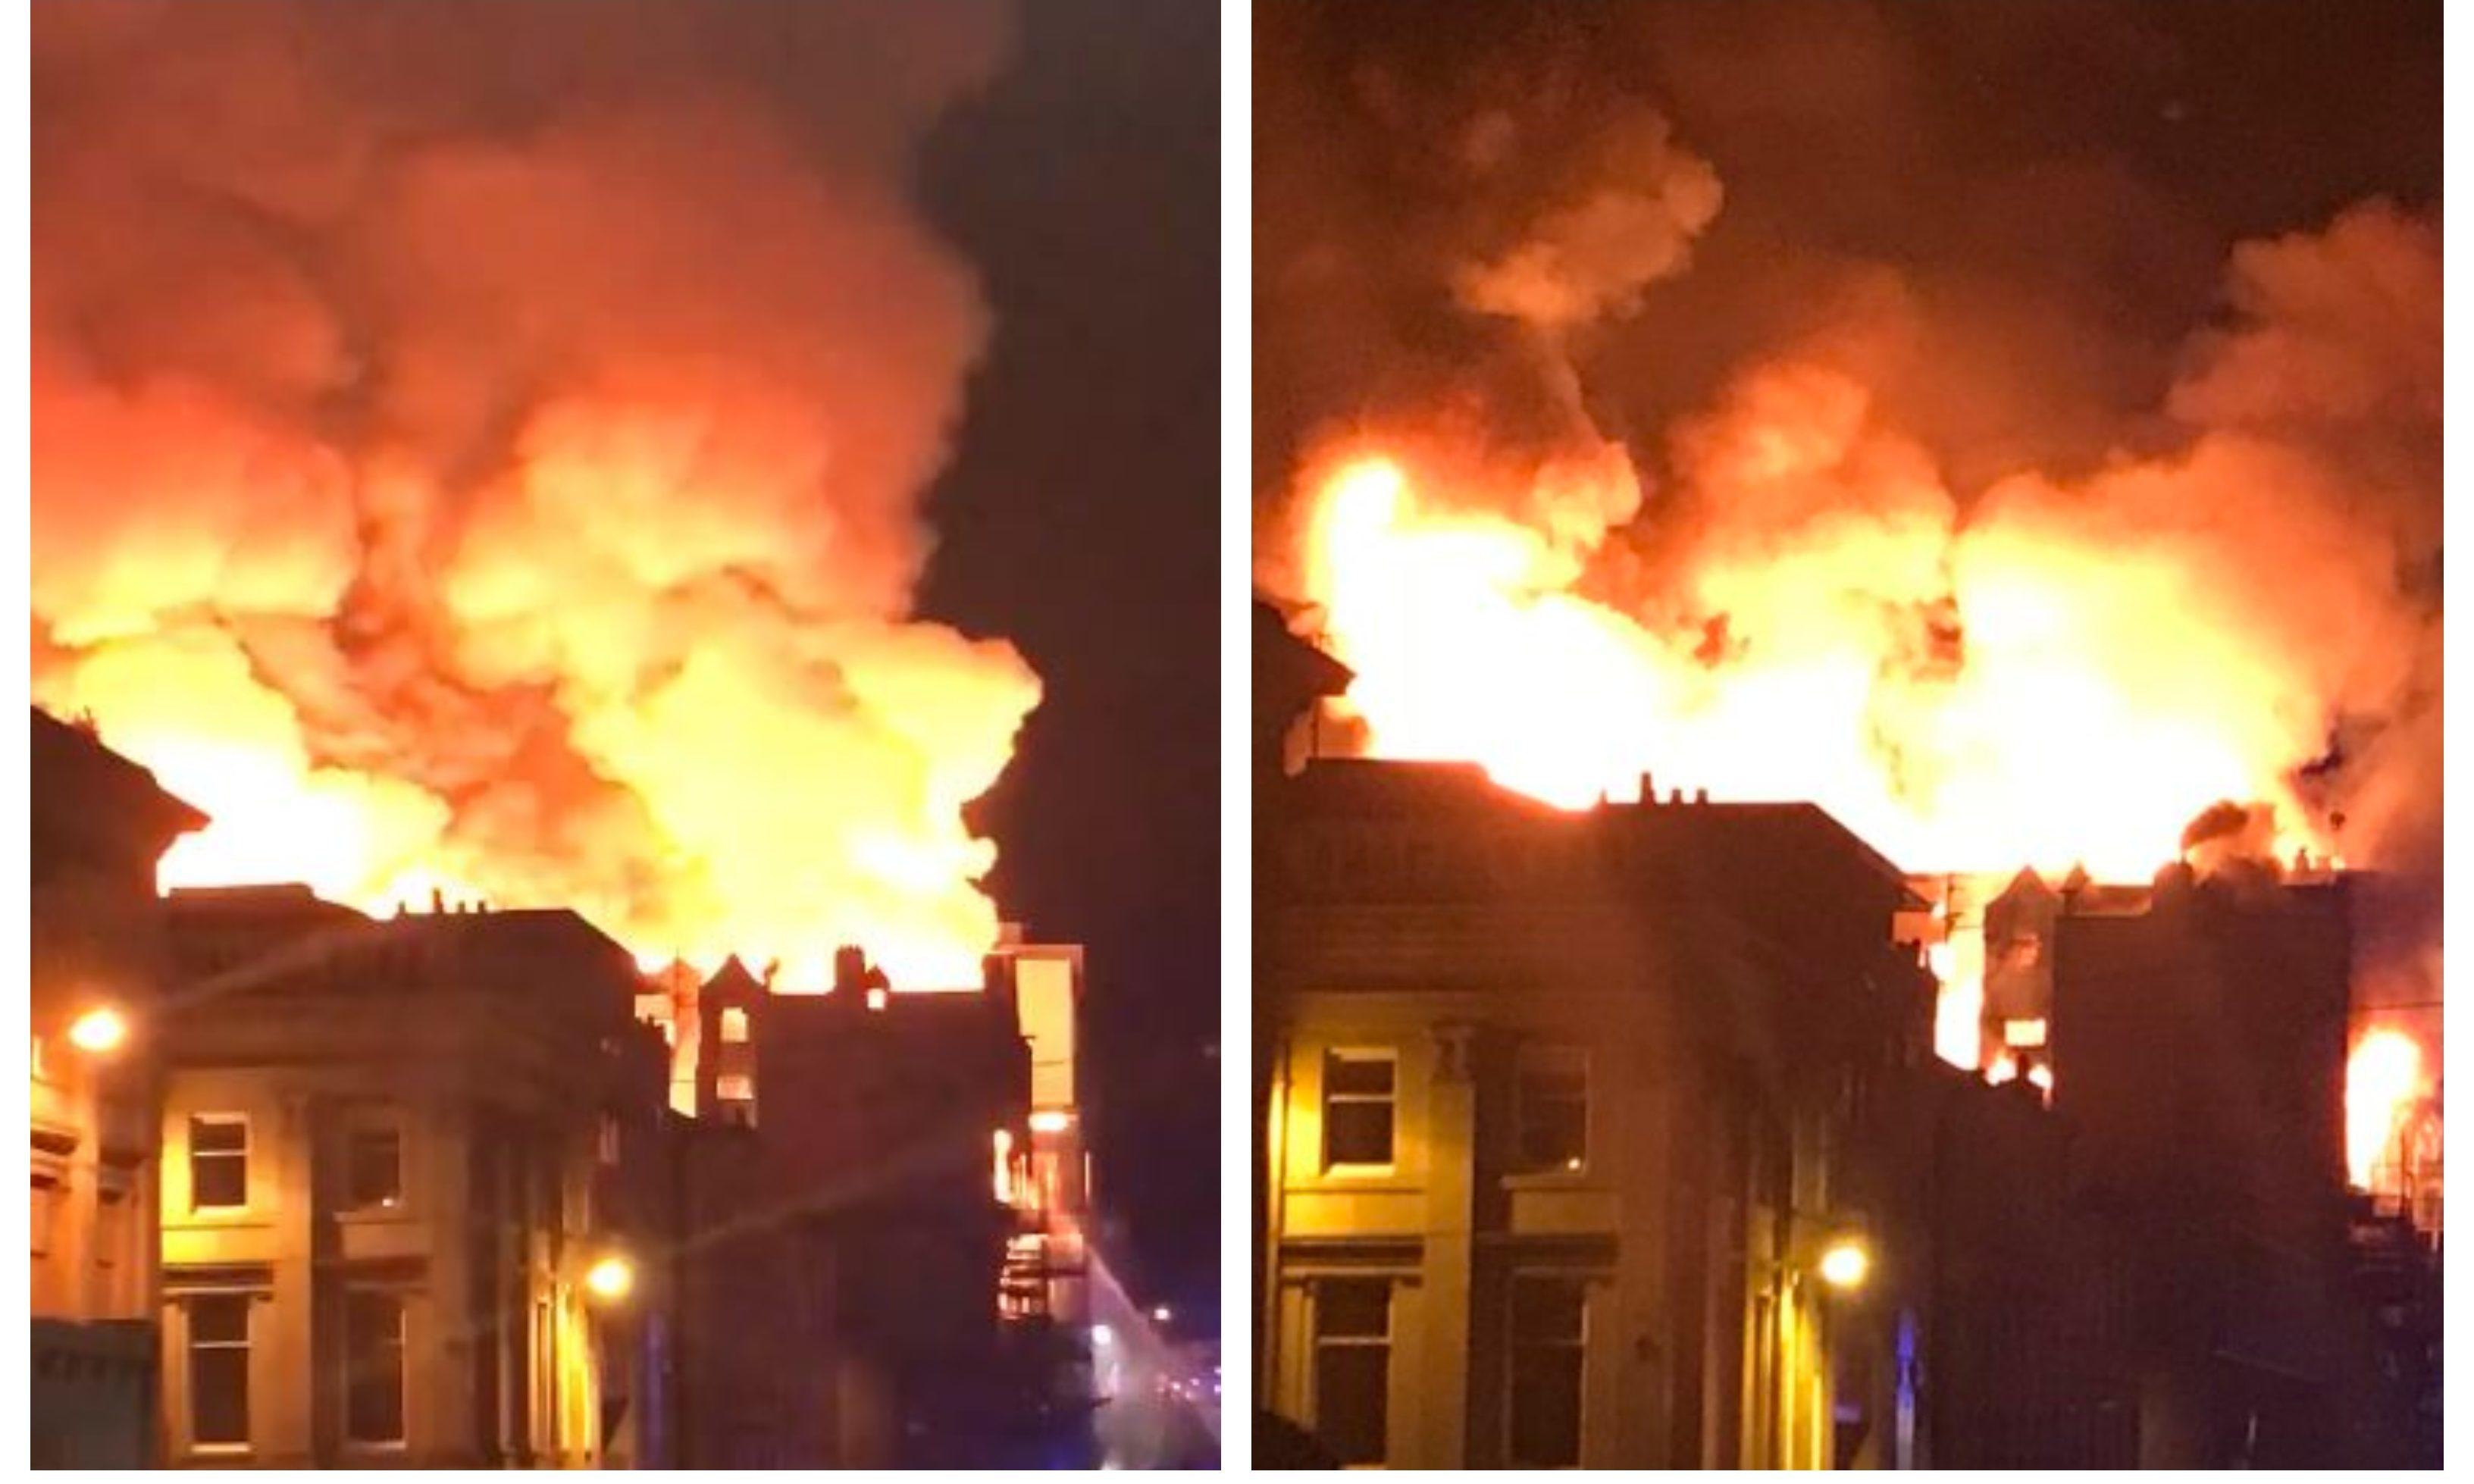 The Mackintosh building fire